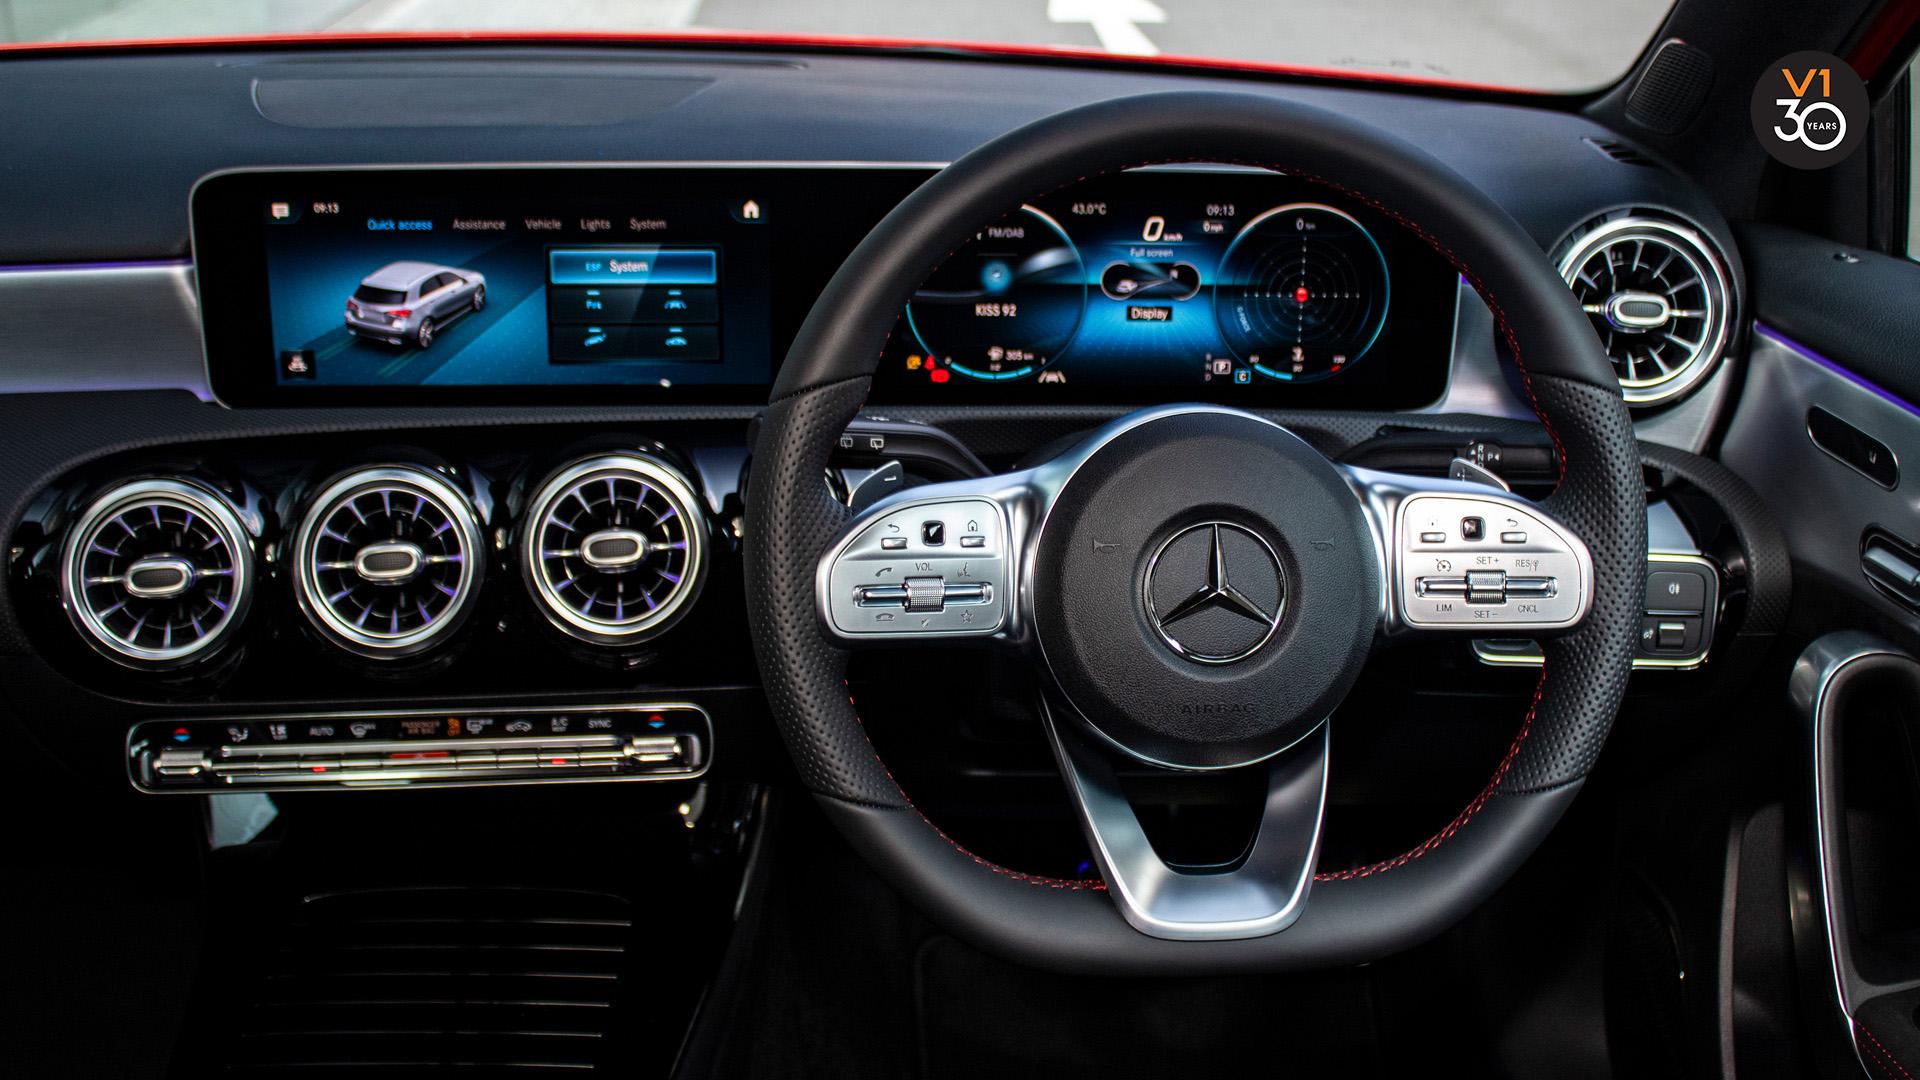 Mercedes A200 AMG Premium Plus - Infotainment System